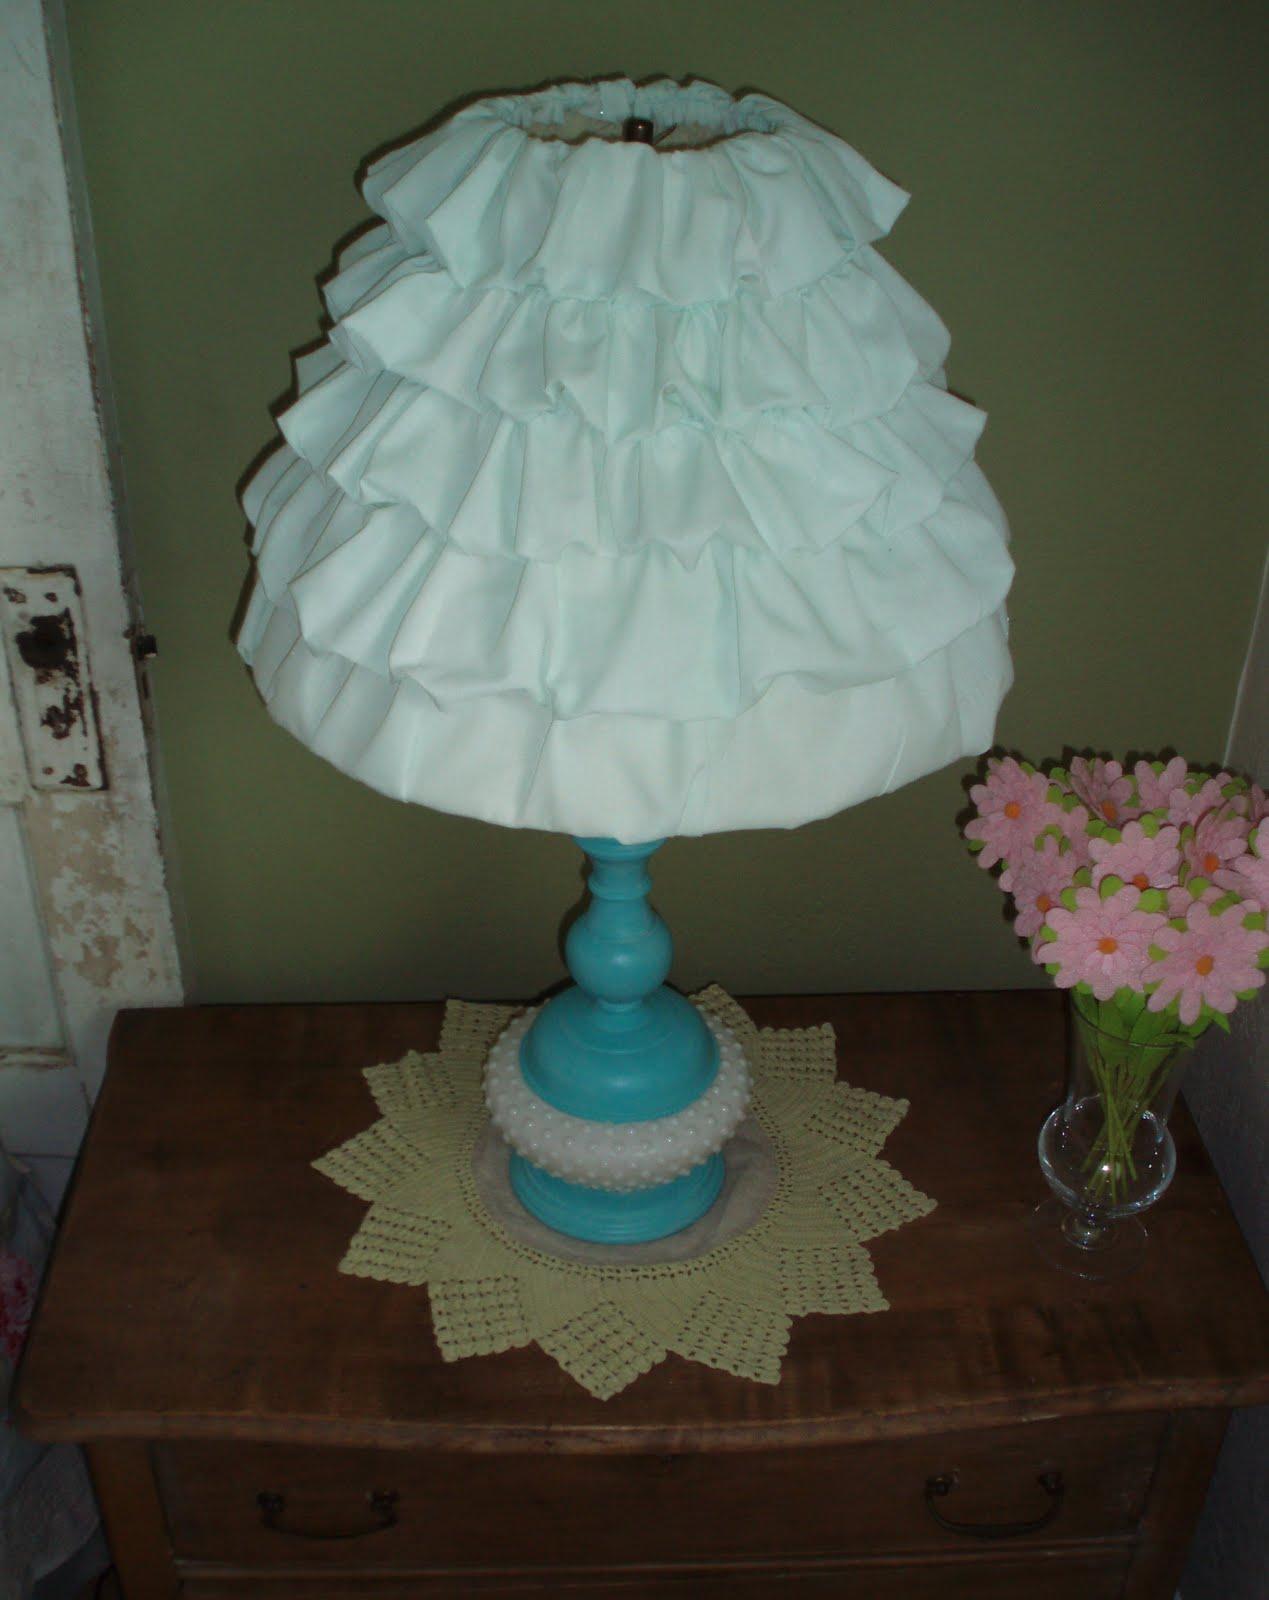 lipstick lamp photo - 3